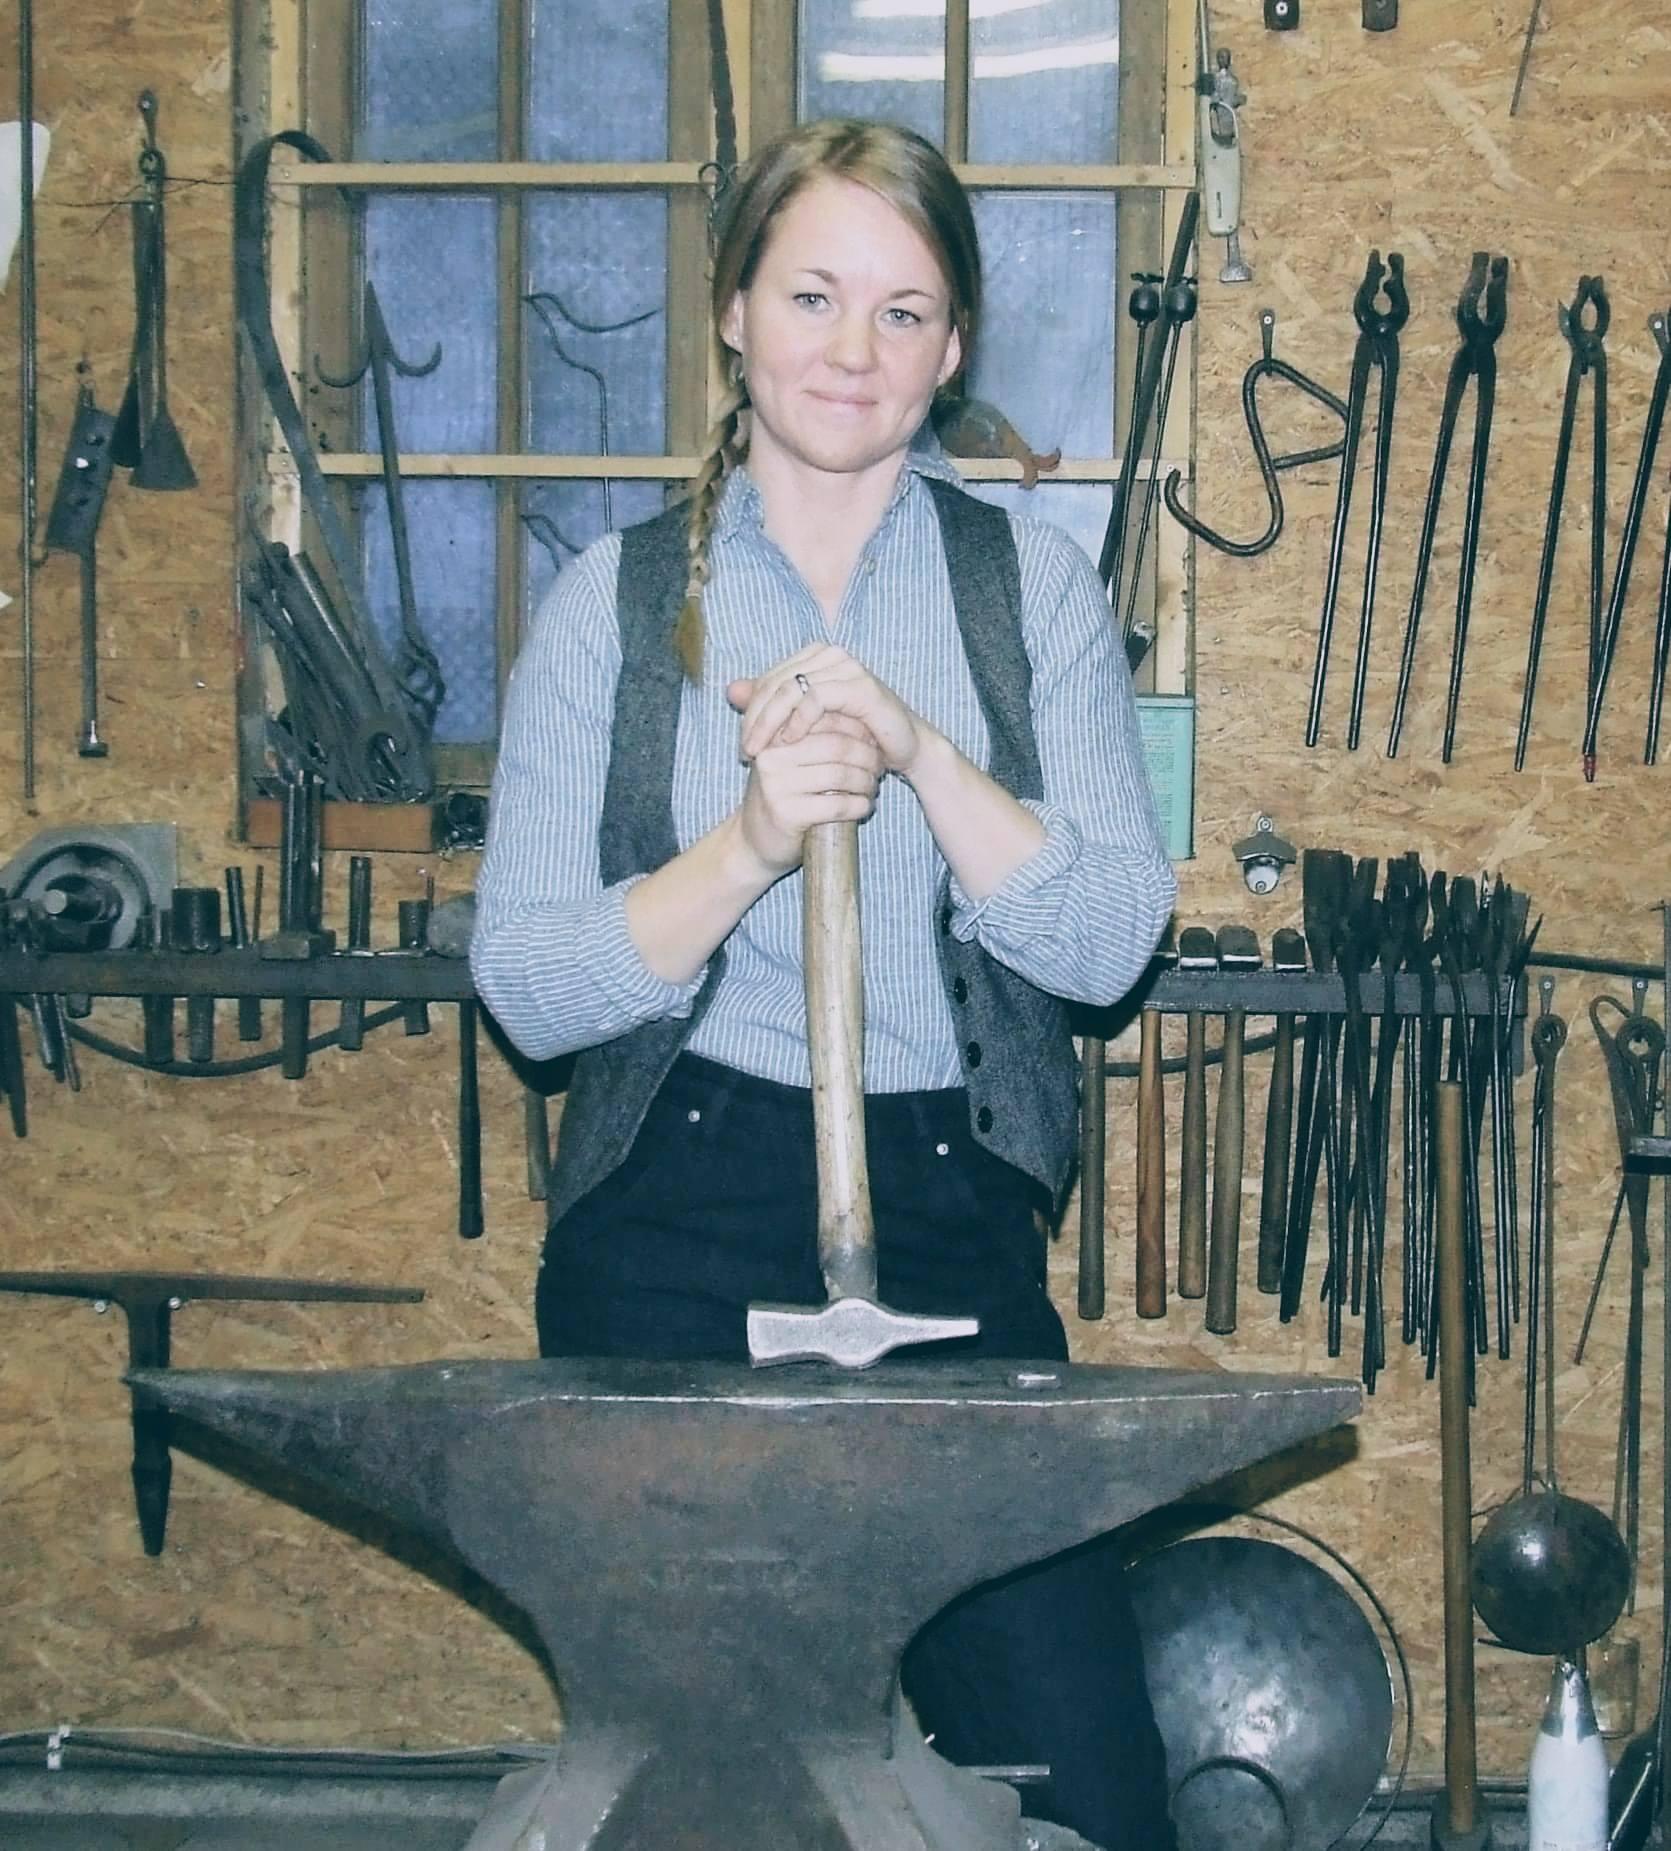 trädgård designer trädgårdsverktyg. Johanna